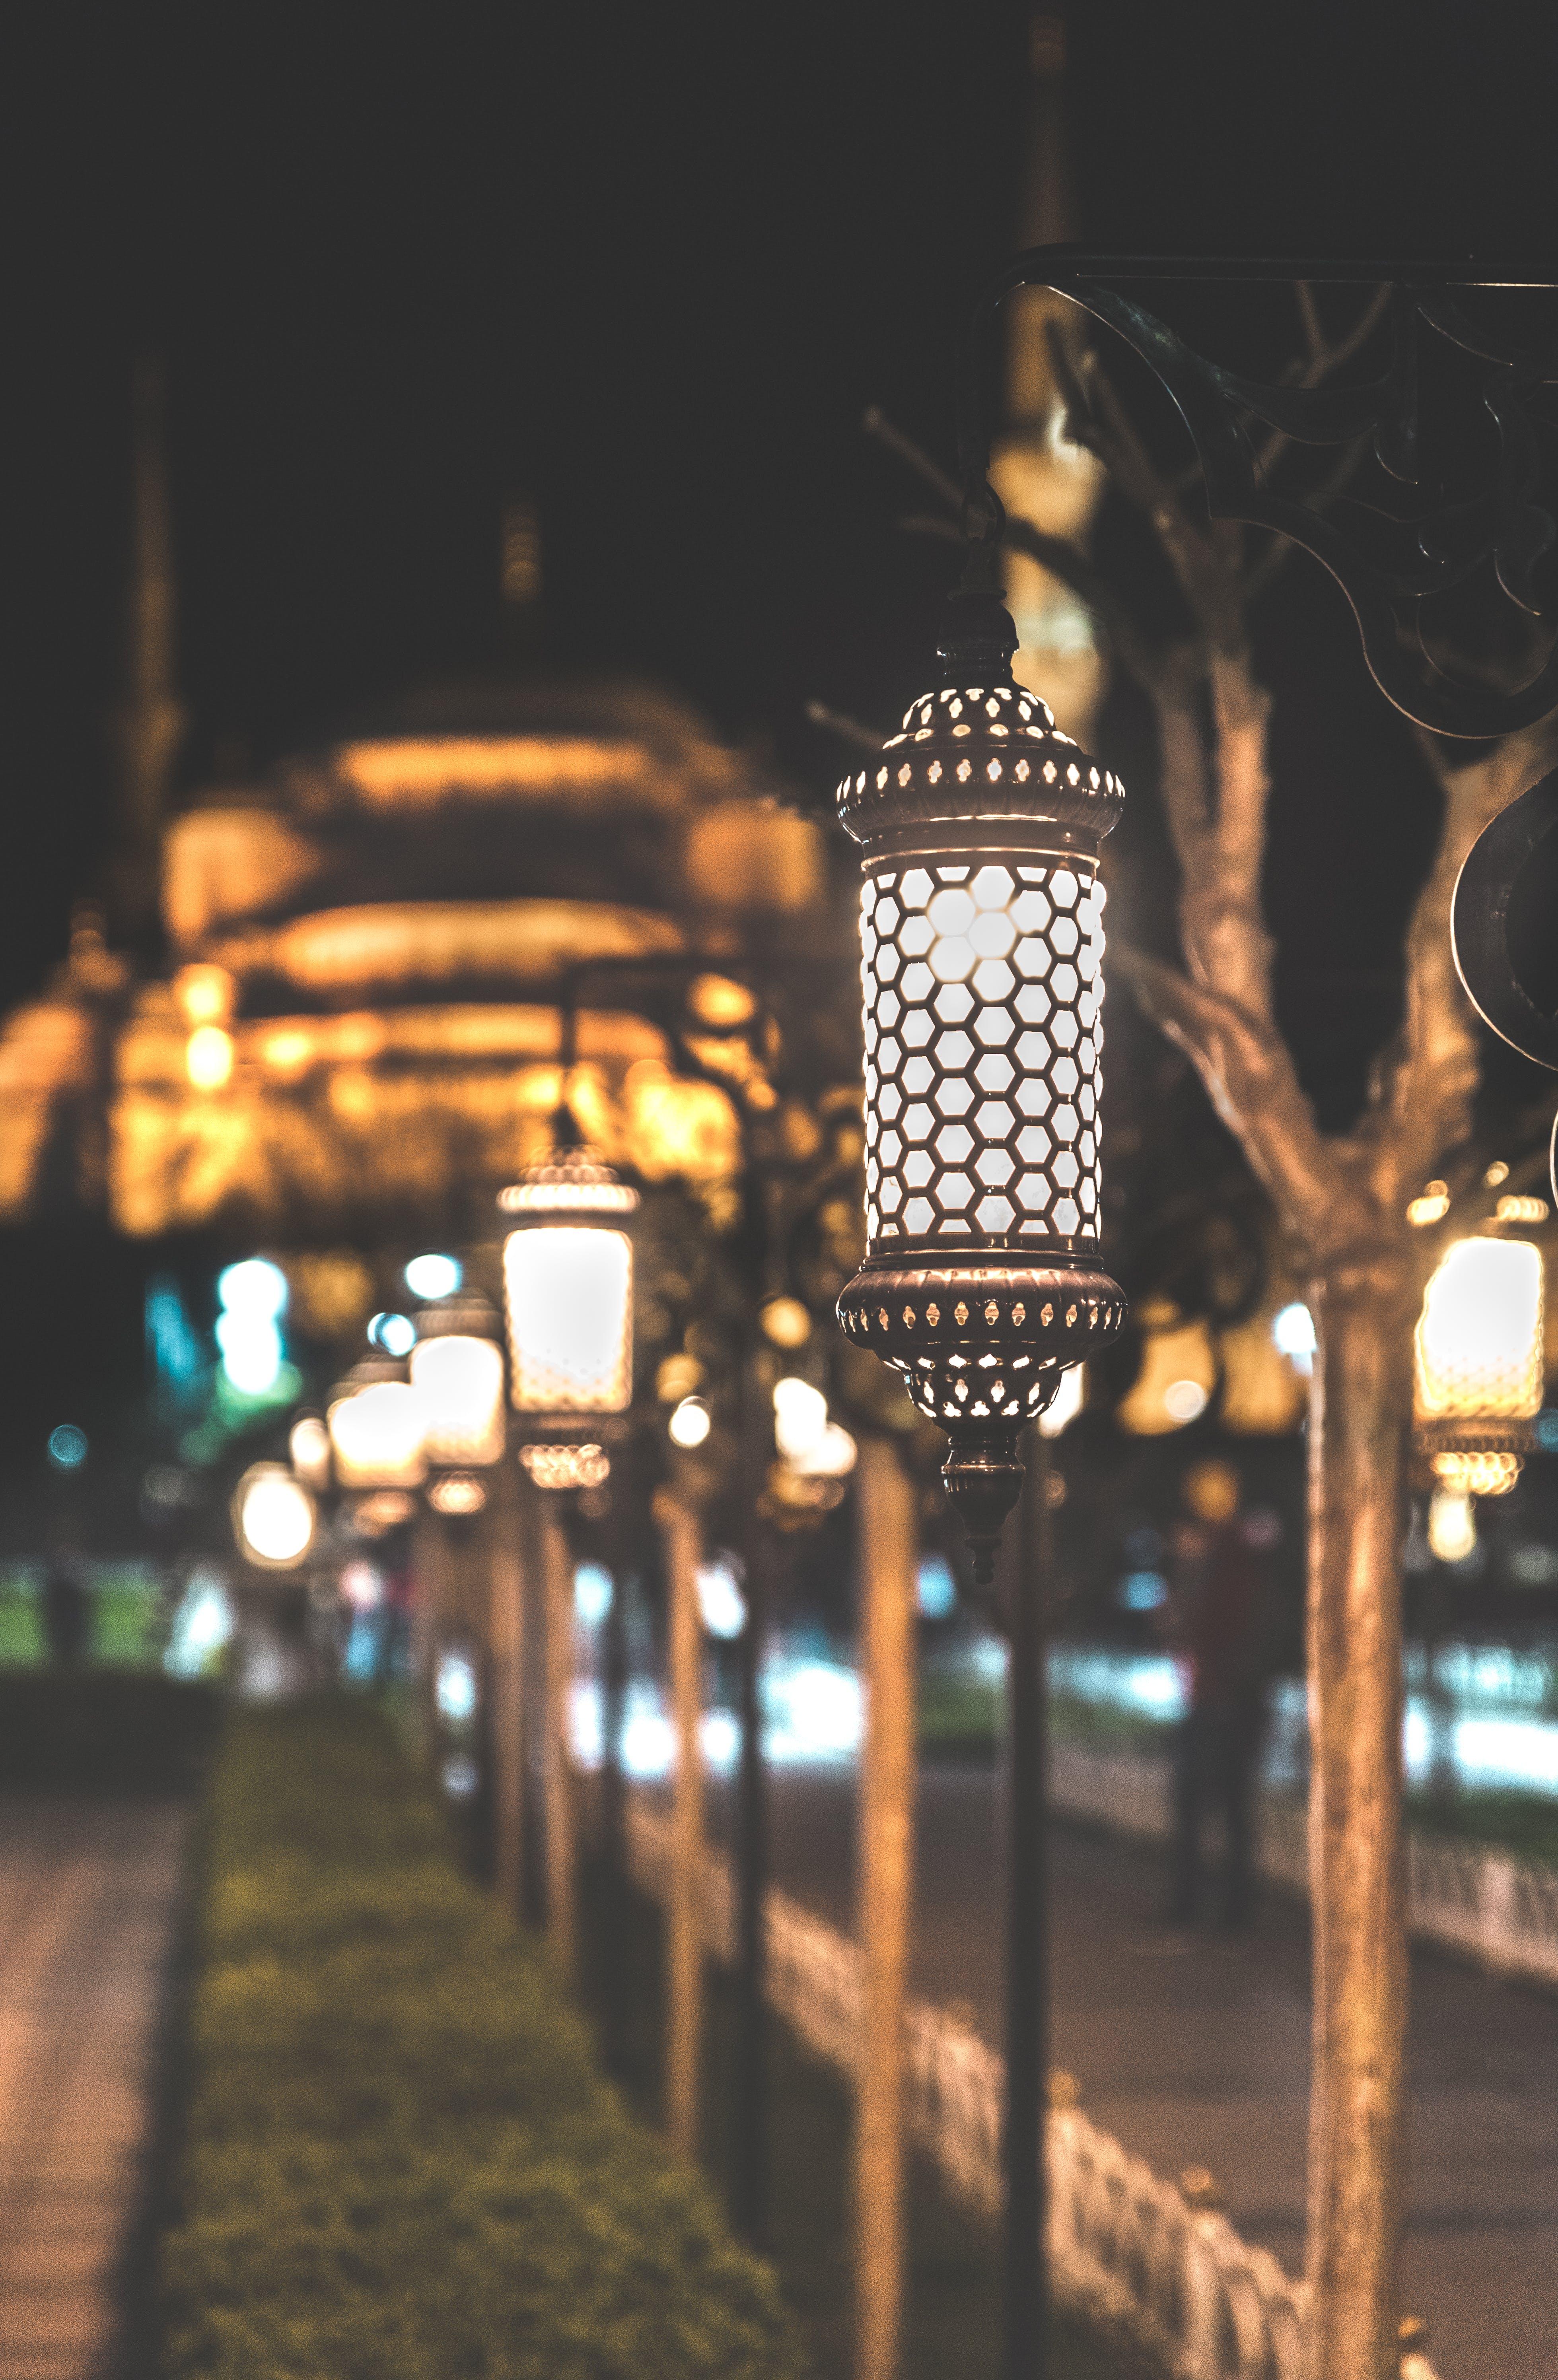 Kostenloses Stock Foto zu abend, beleuchtet, beleuchtung, dämmerung